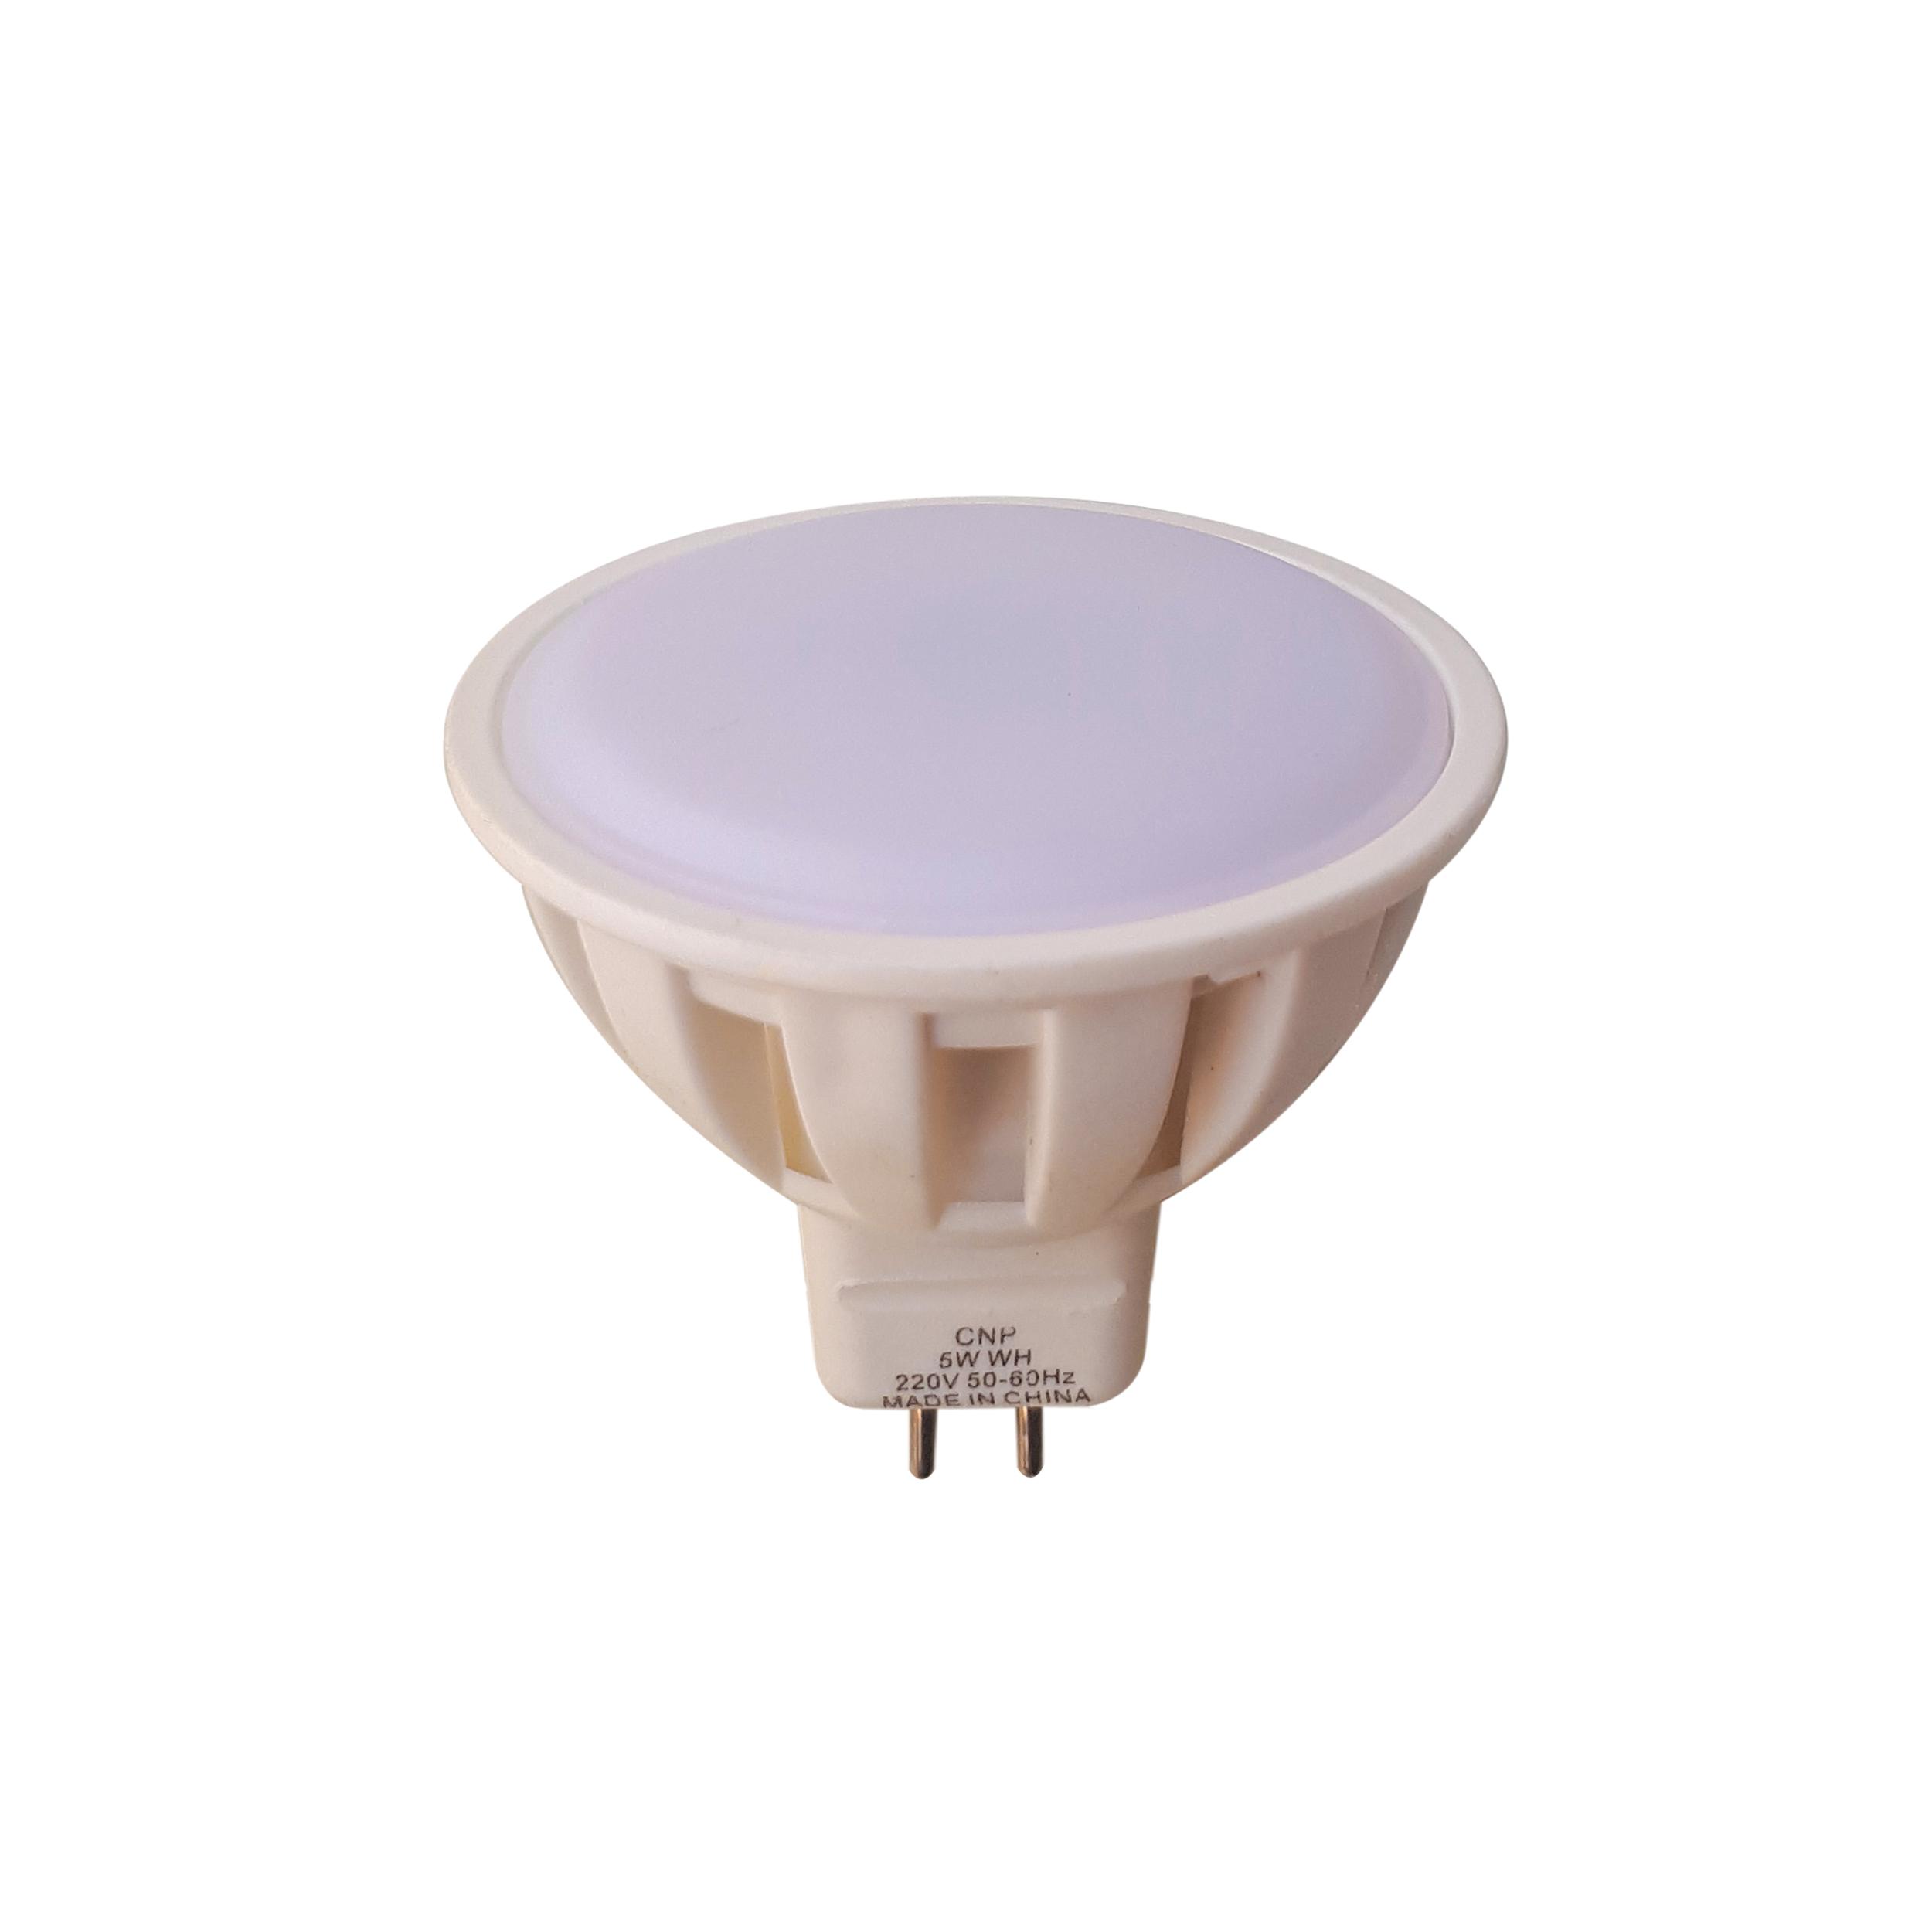 لامپ هالوژن ال ای دی 5 وات کد CNP پایه سوزنی  thumb